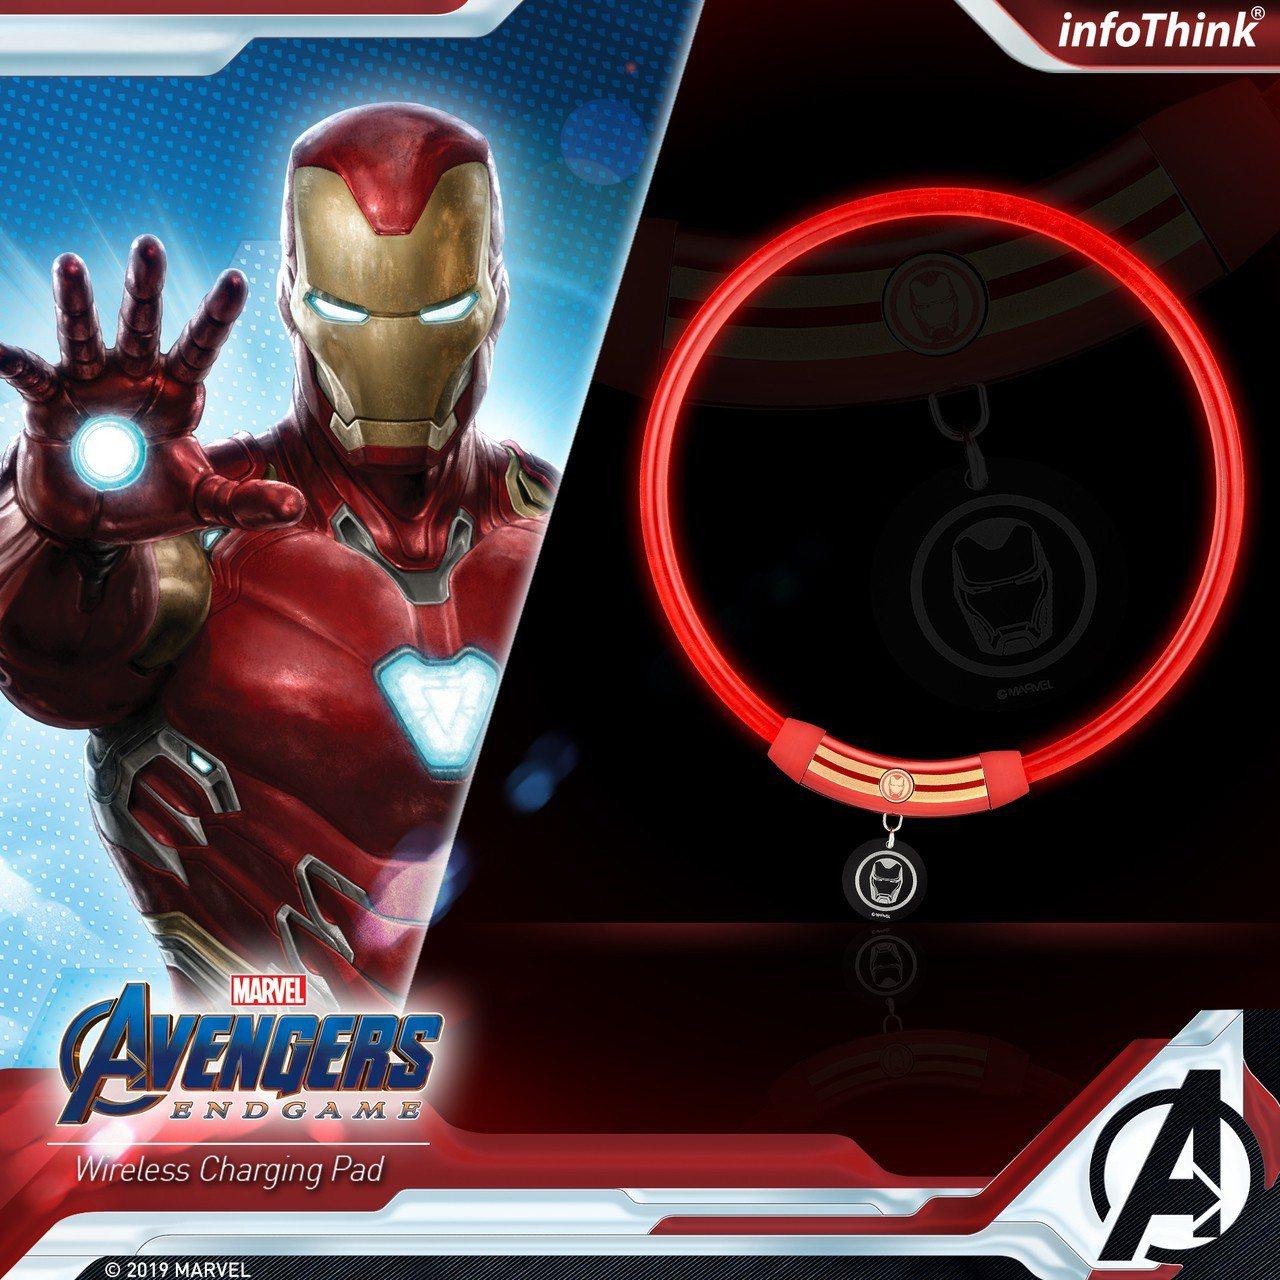 7-ELEVEN將於4月24日起獨家搶先開賣復仇者聯盟系列LED燈環,鋼鐵人款售...